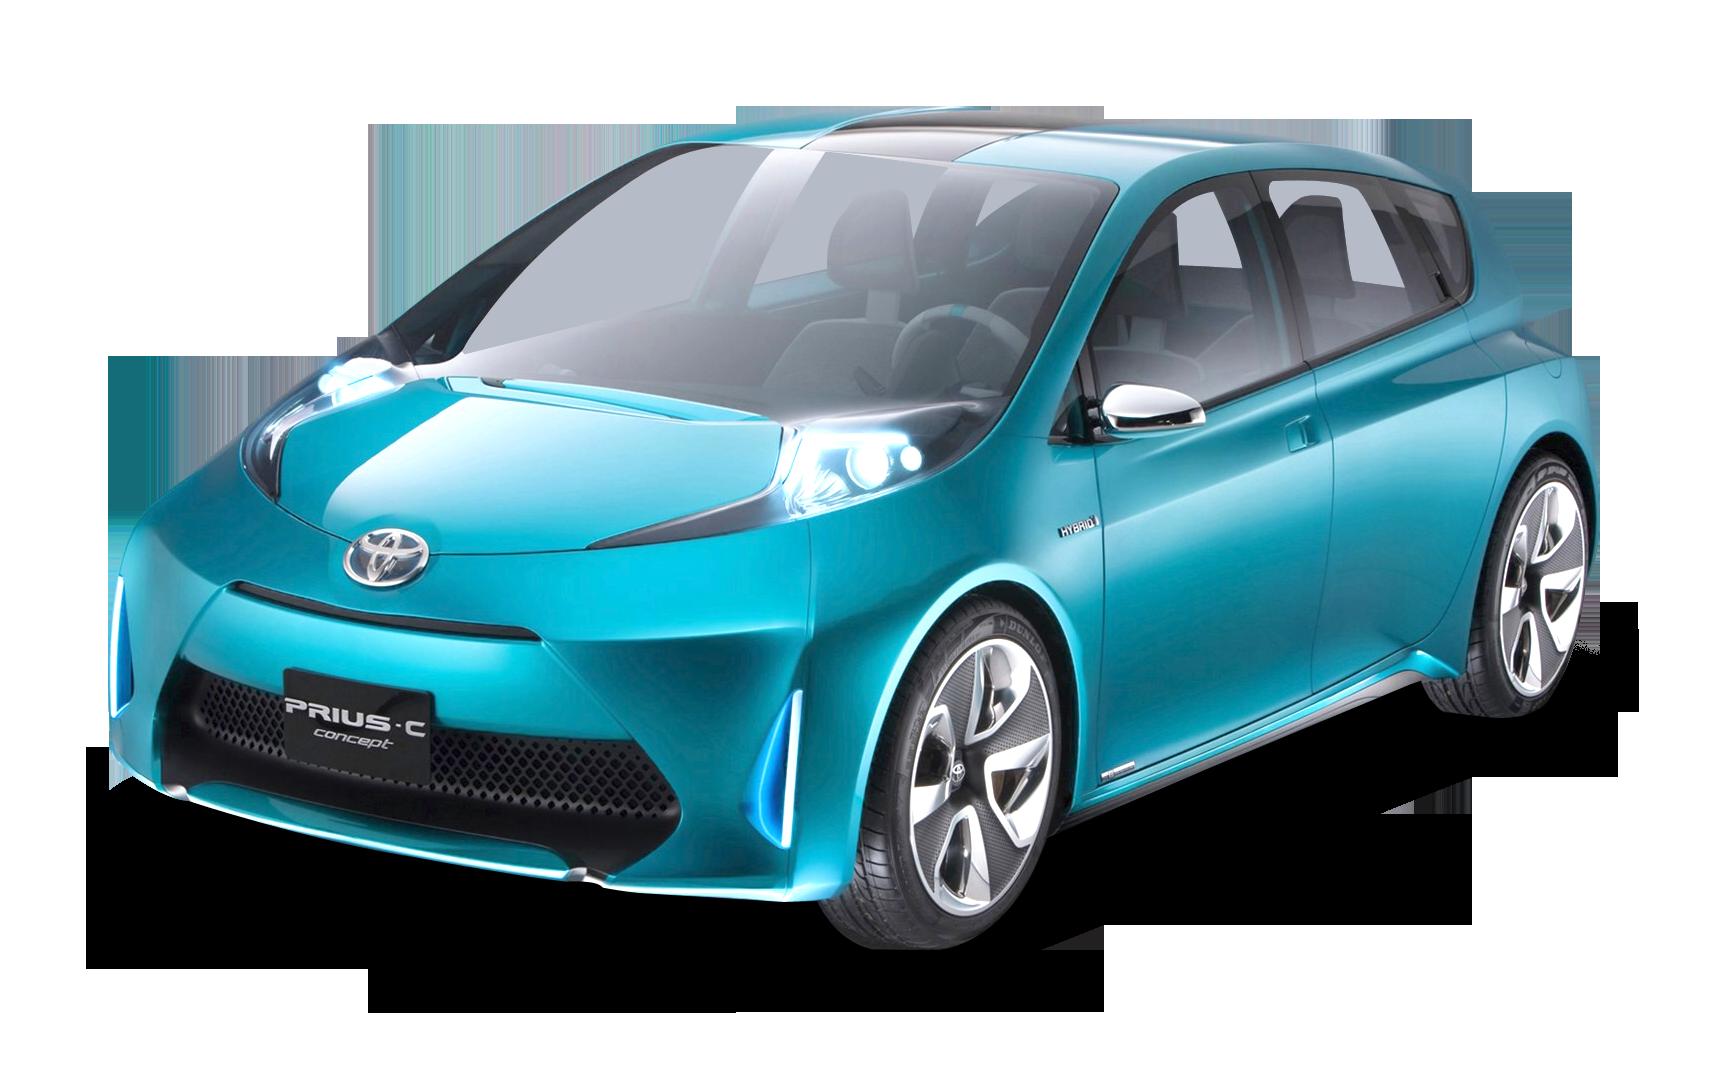 Toyota Prius C Car PNG Image